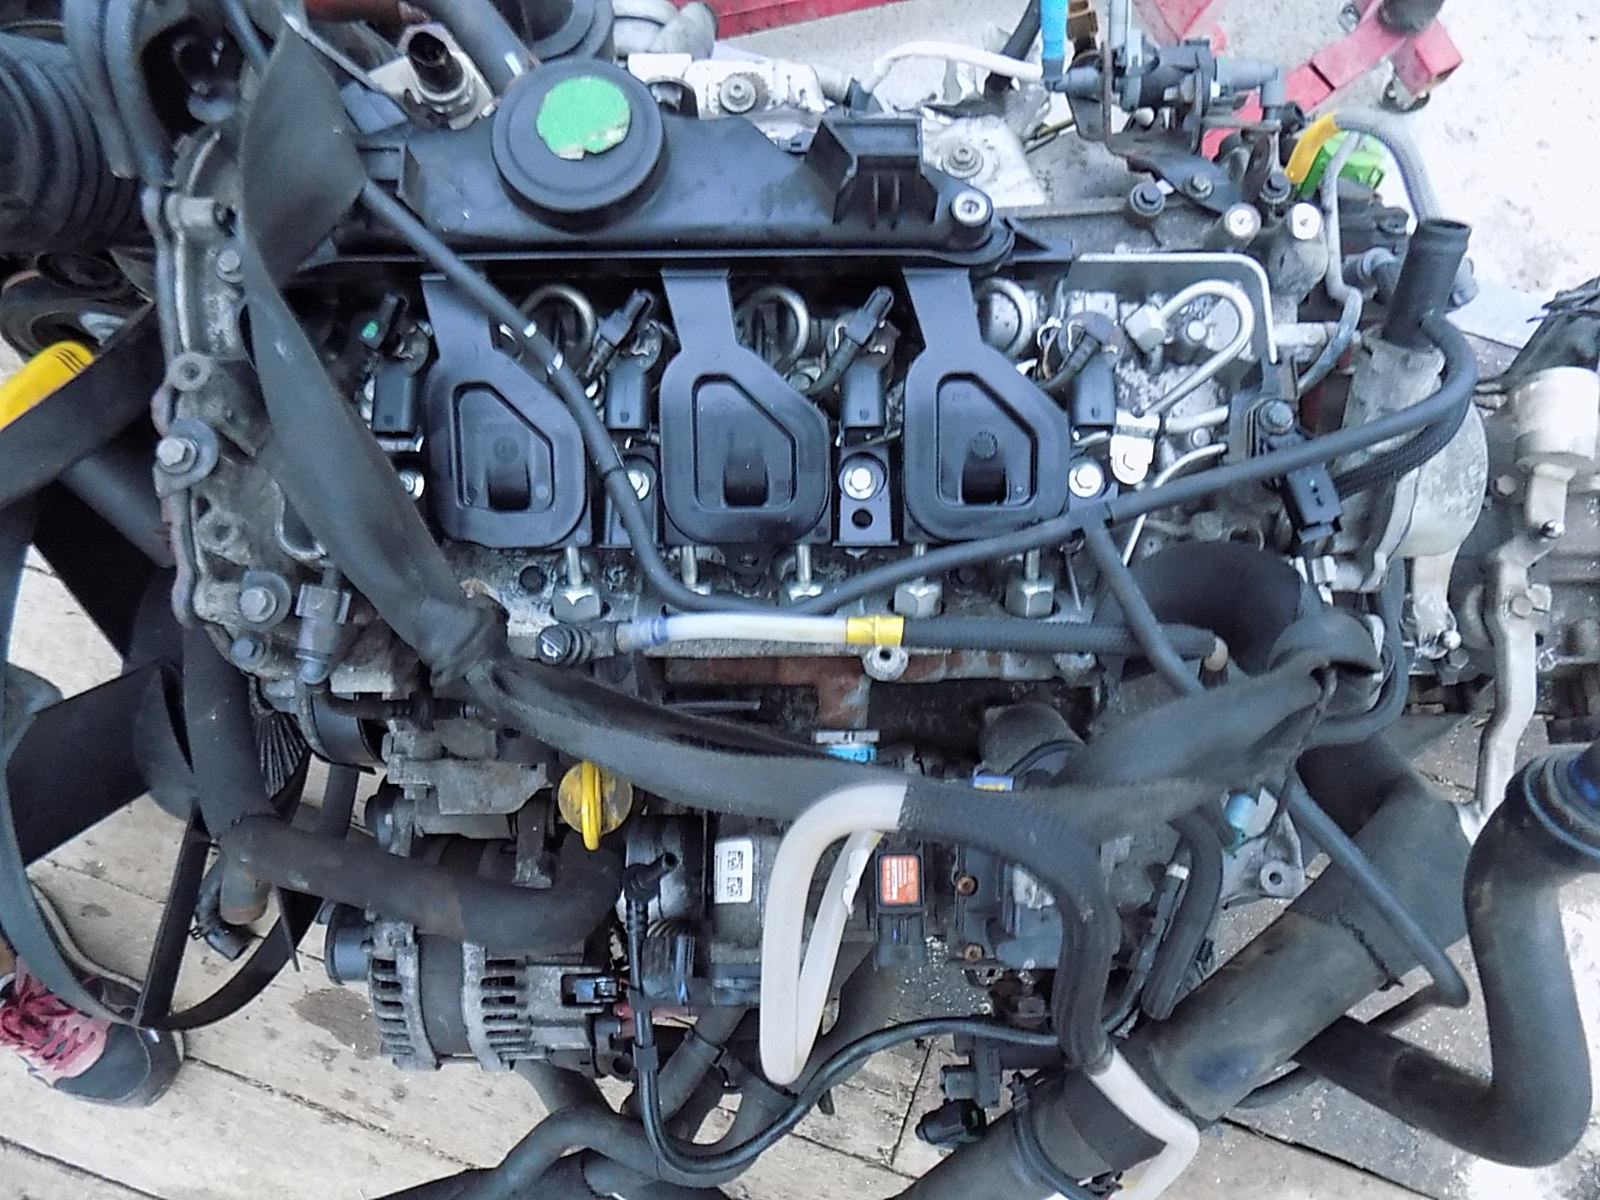 motor renault master , opel movano 2.3 cdti 2015 o singura turbina 80,000 de mile M9TH898